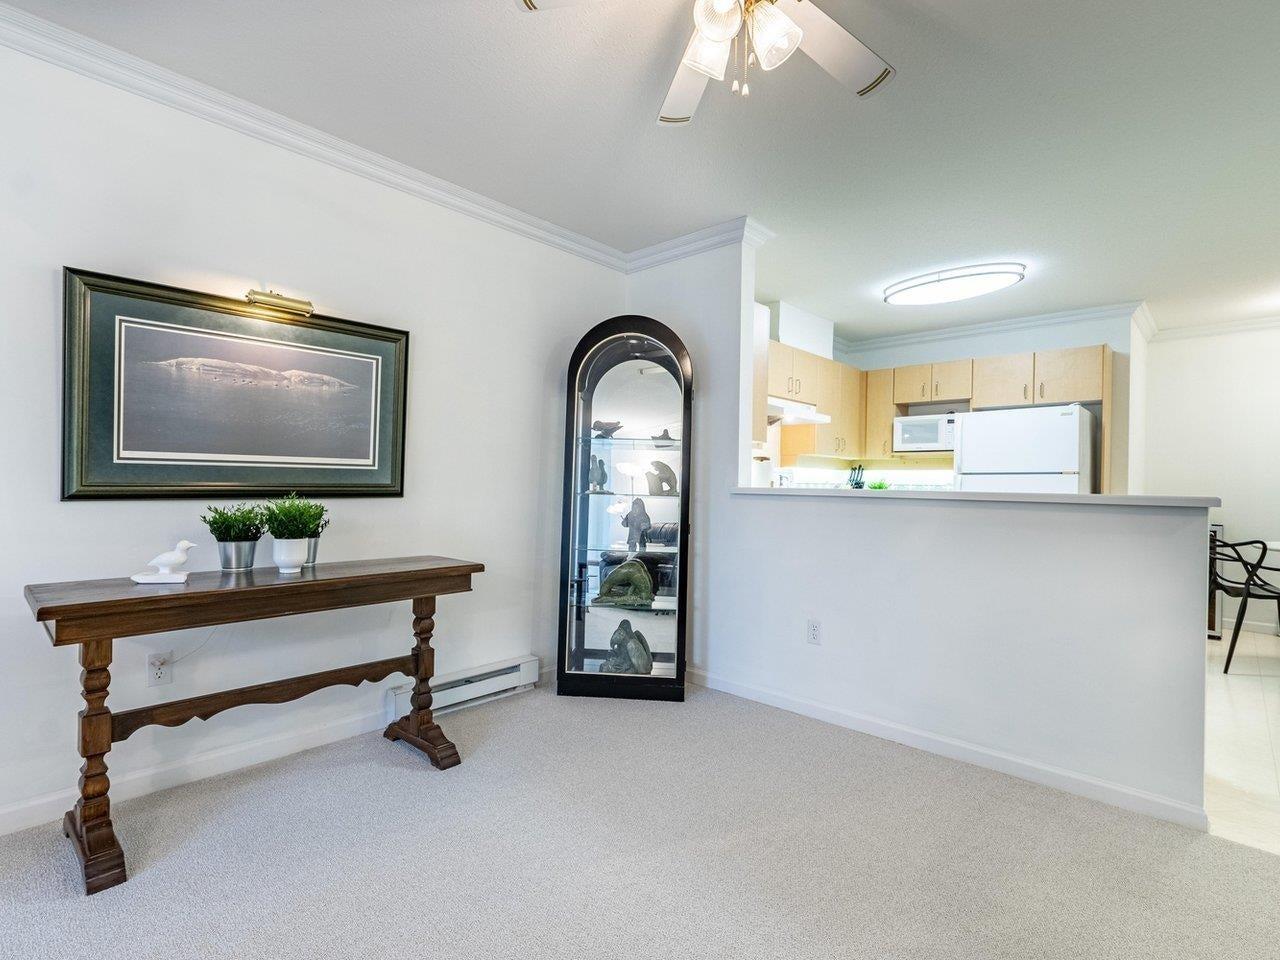 306 15298 20 AVENUE - King George Corridor Apartment/Condo for sale, 2 Bedrooms (R2625551) - #11